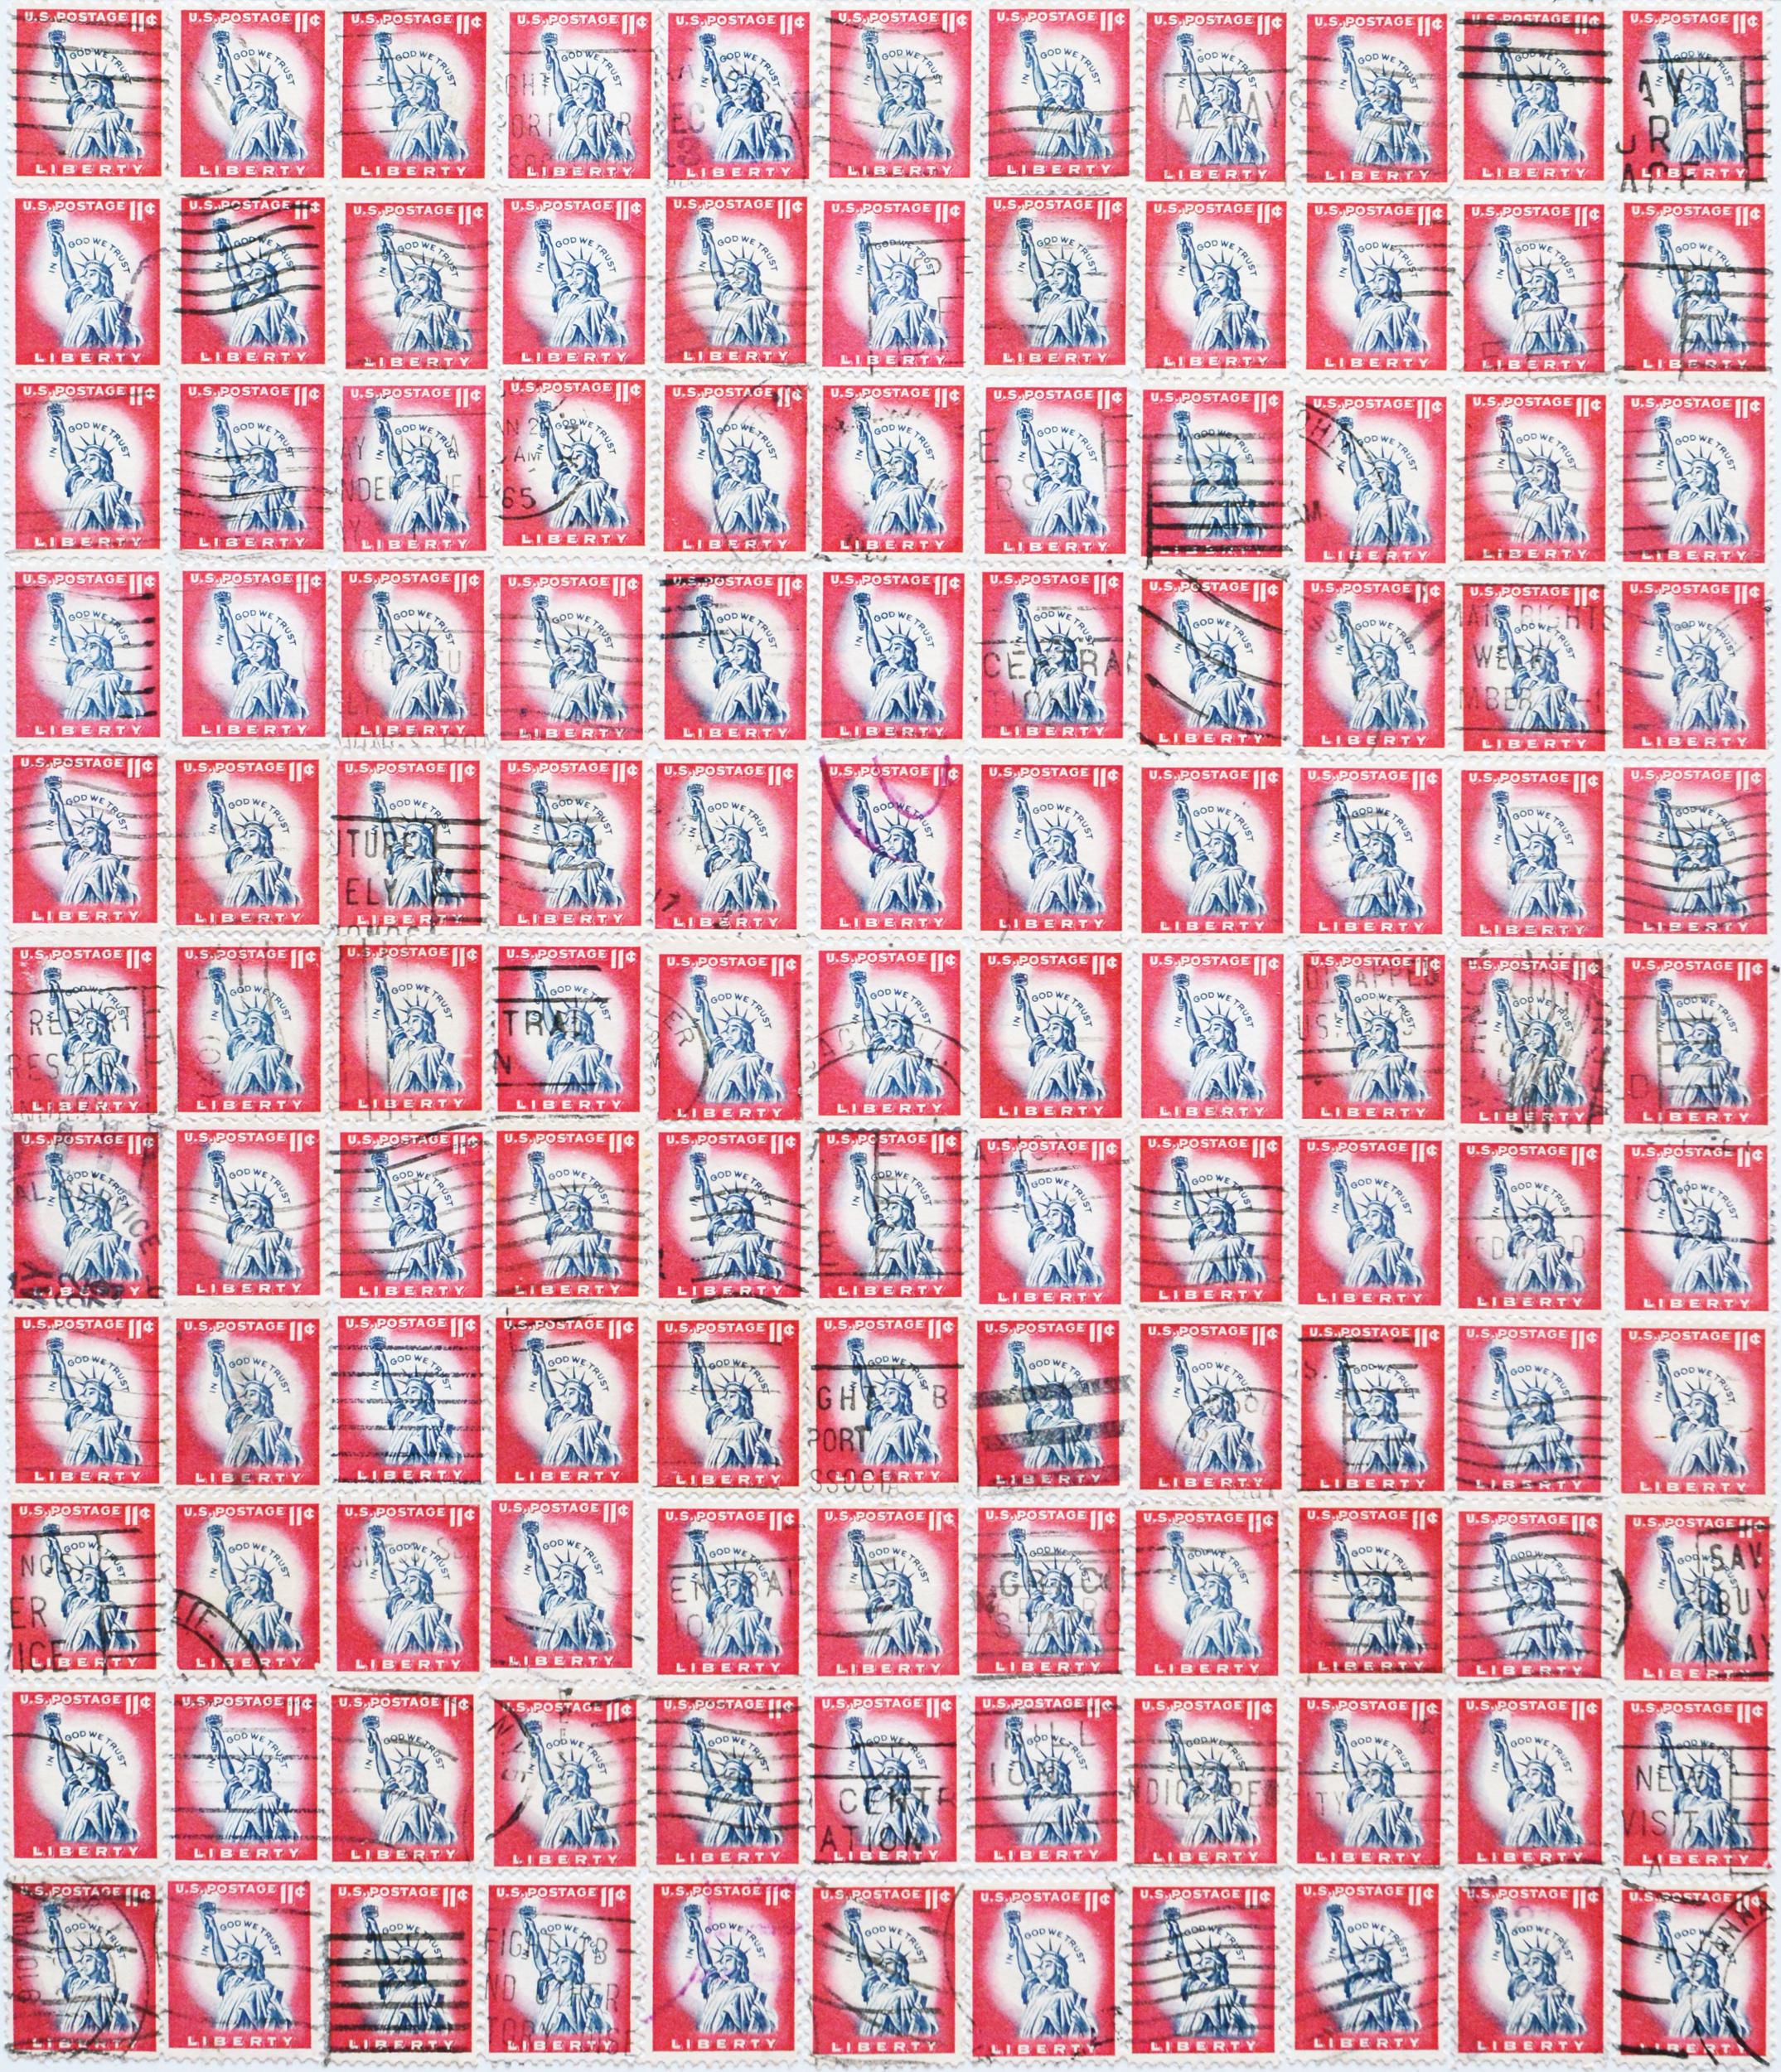 Liberty, 11 cents, 2013